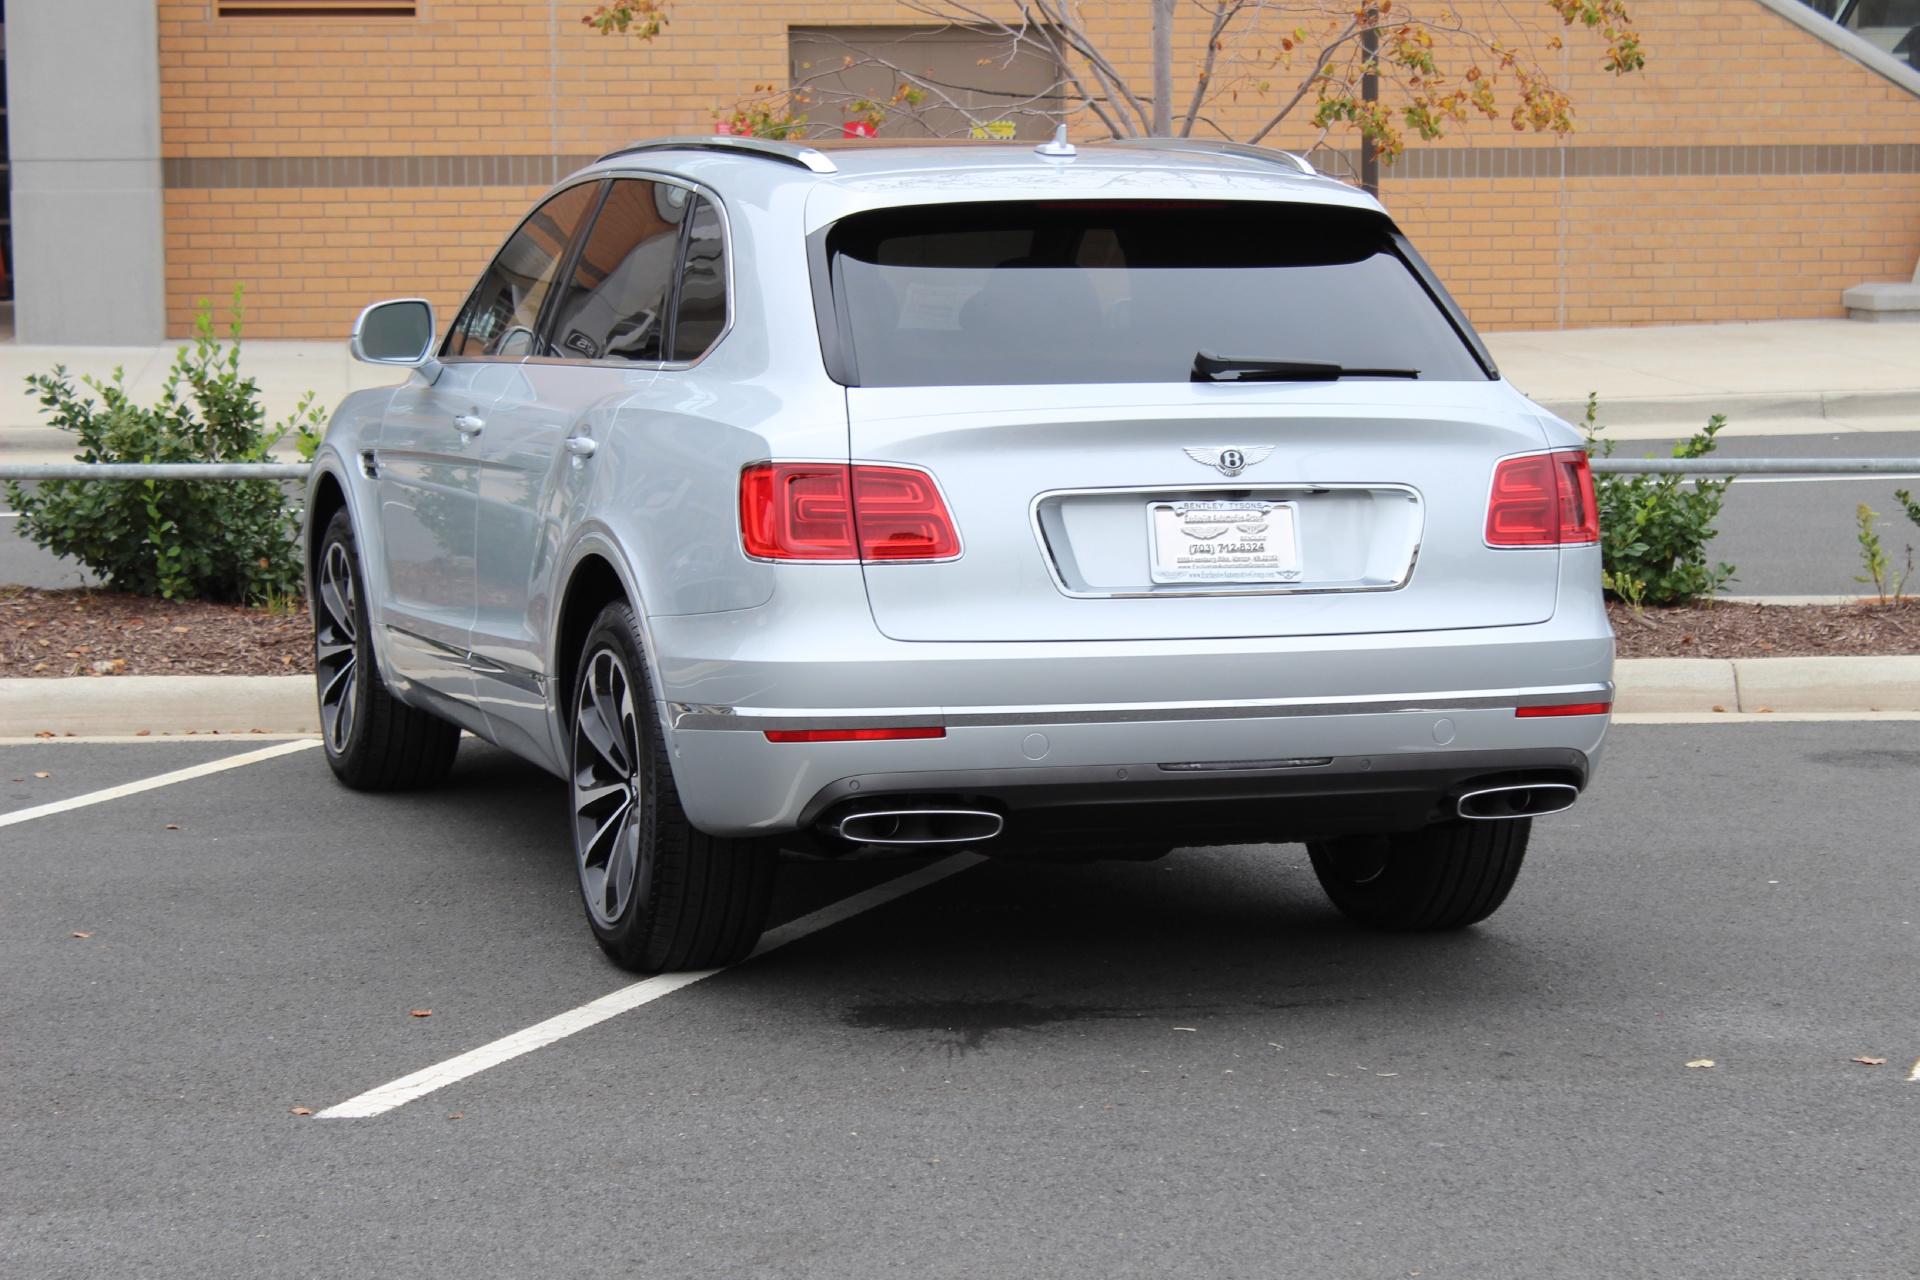 2017 Bentley Bentayga Stock 7NC for sale near Vienna VA